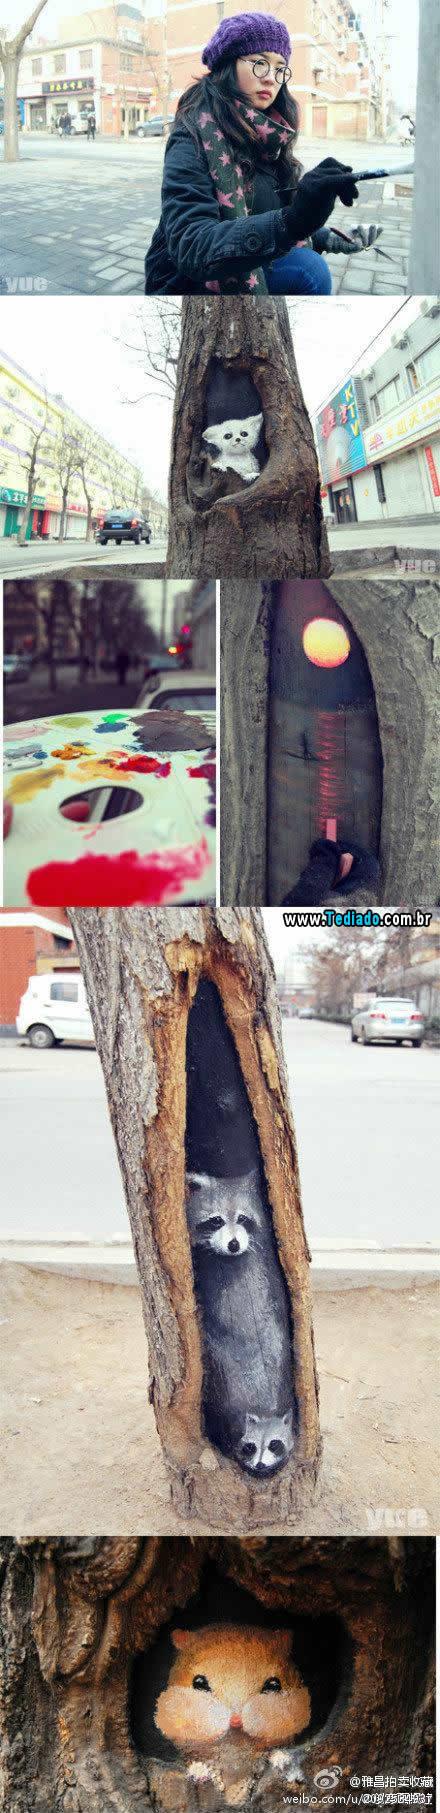 Menina talentosa transforma buracos de árvores em vista linda com seu pincel 3